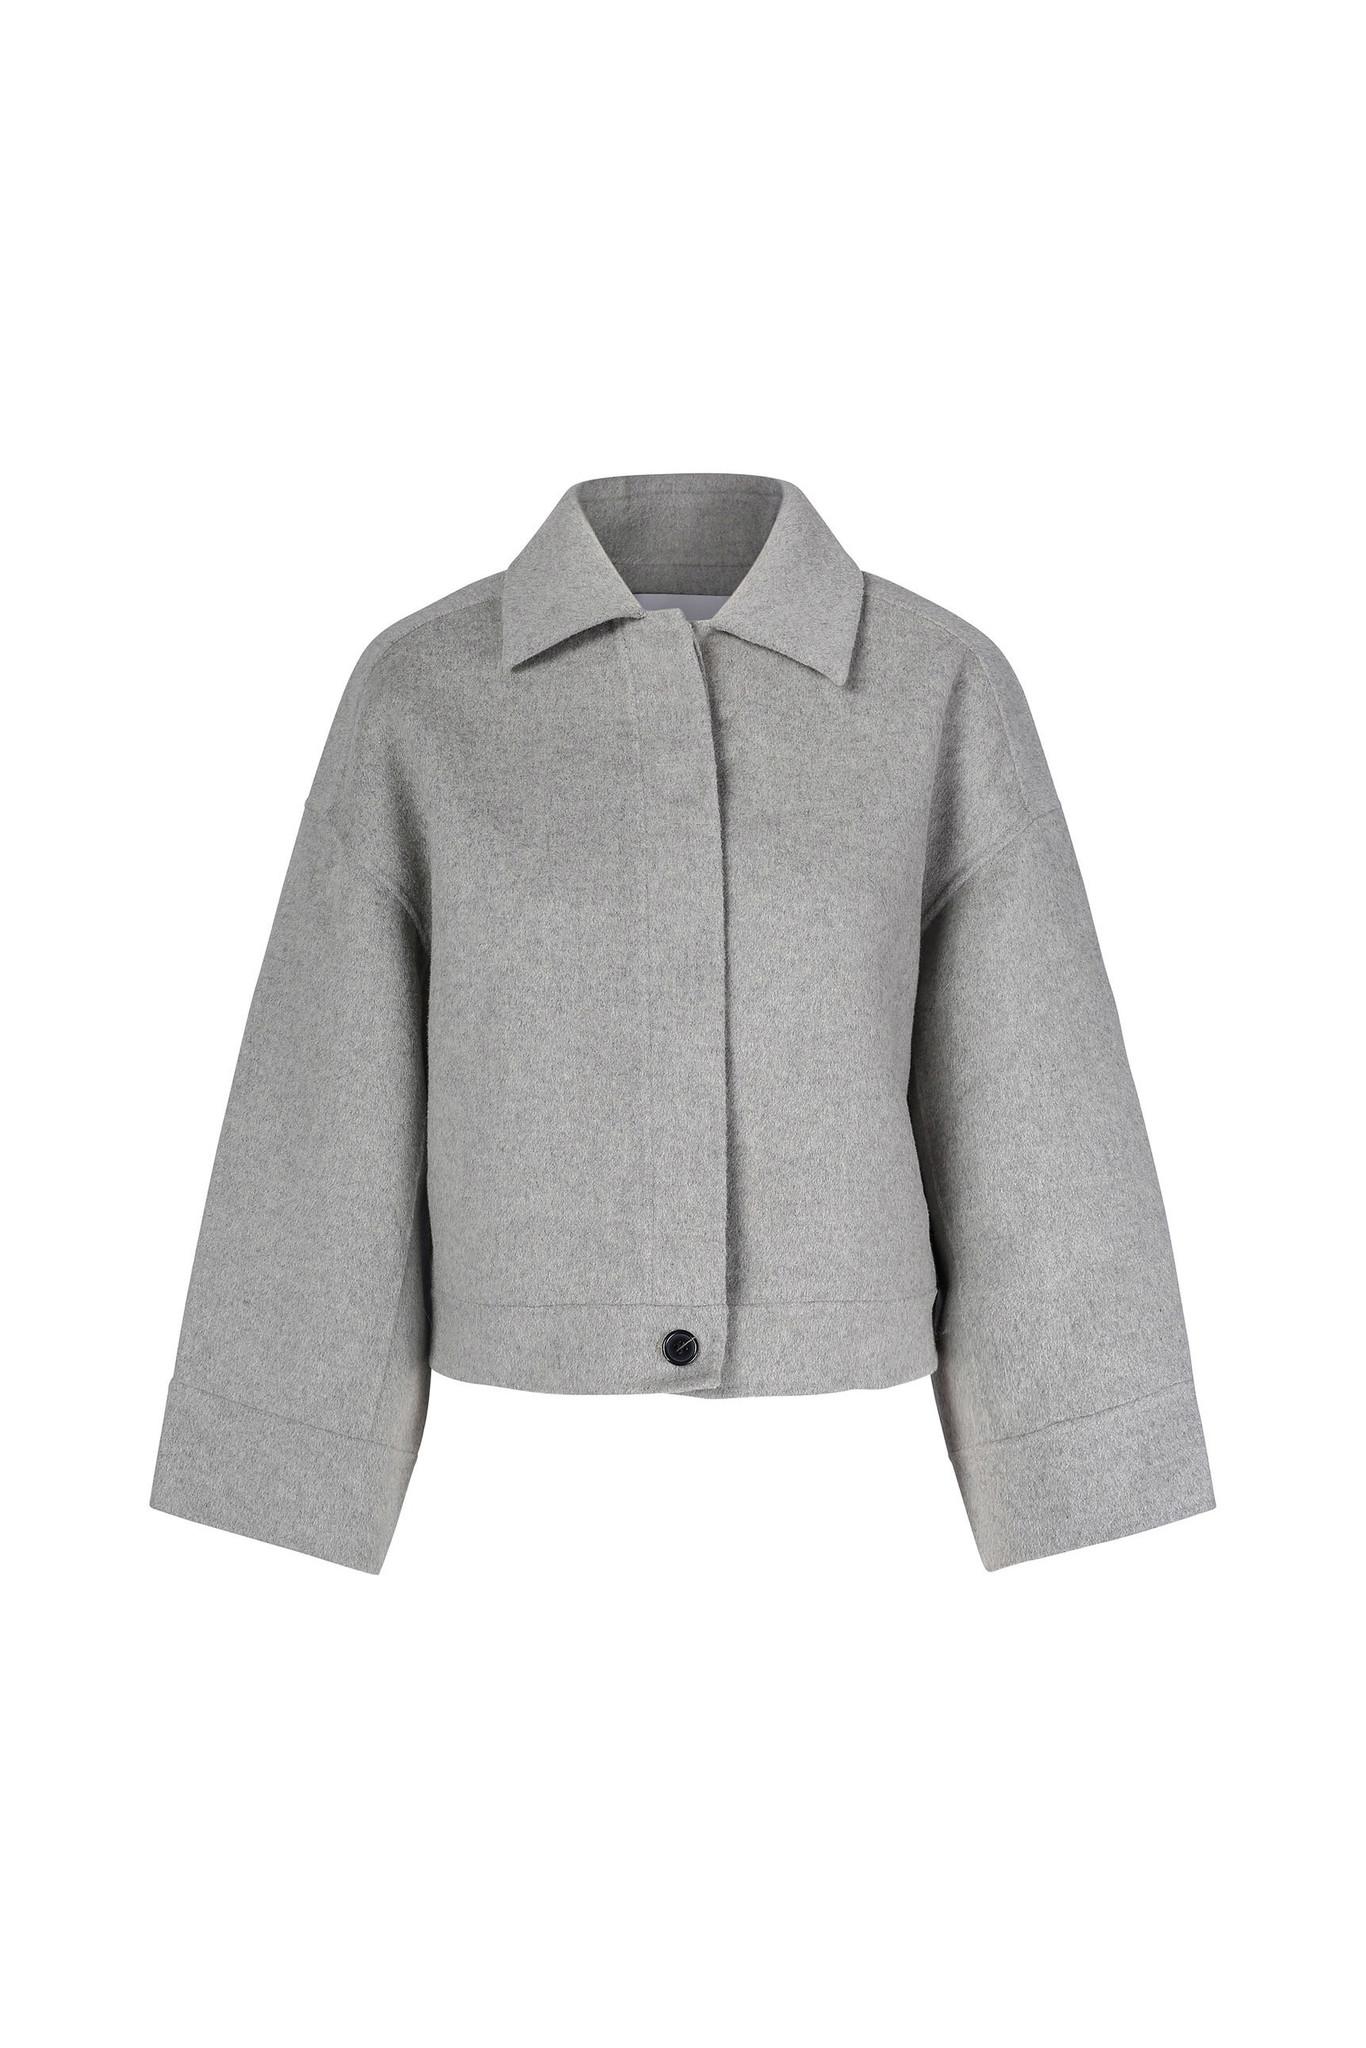 Andy Wool Jacket - Light Grey XS-1